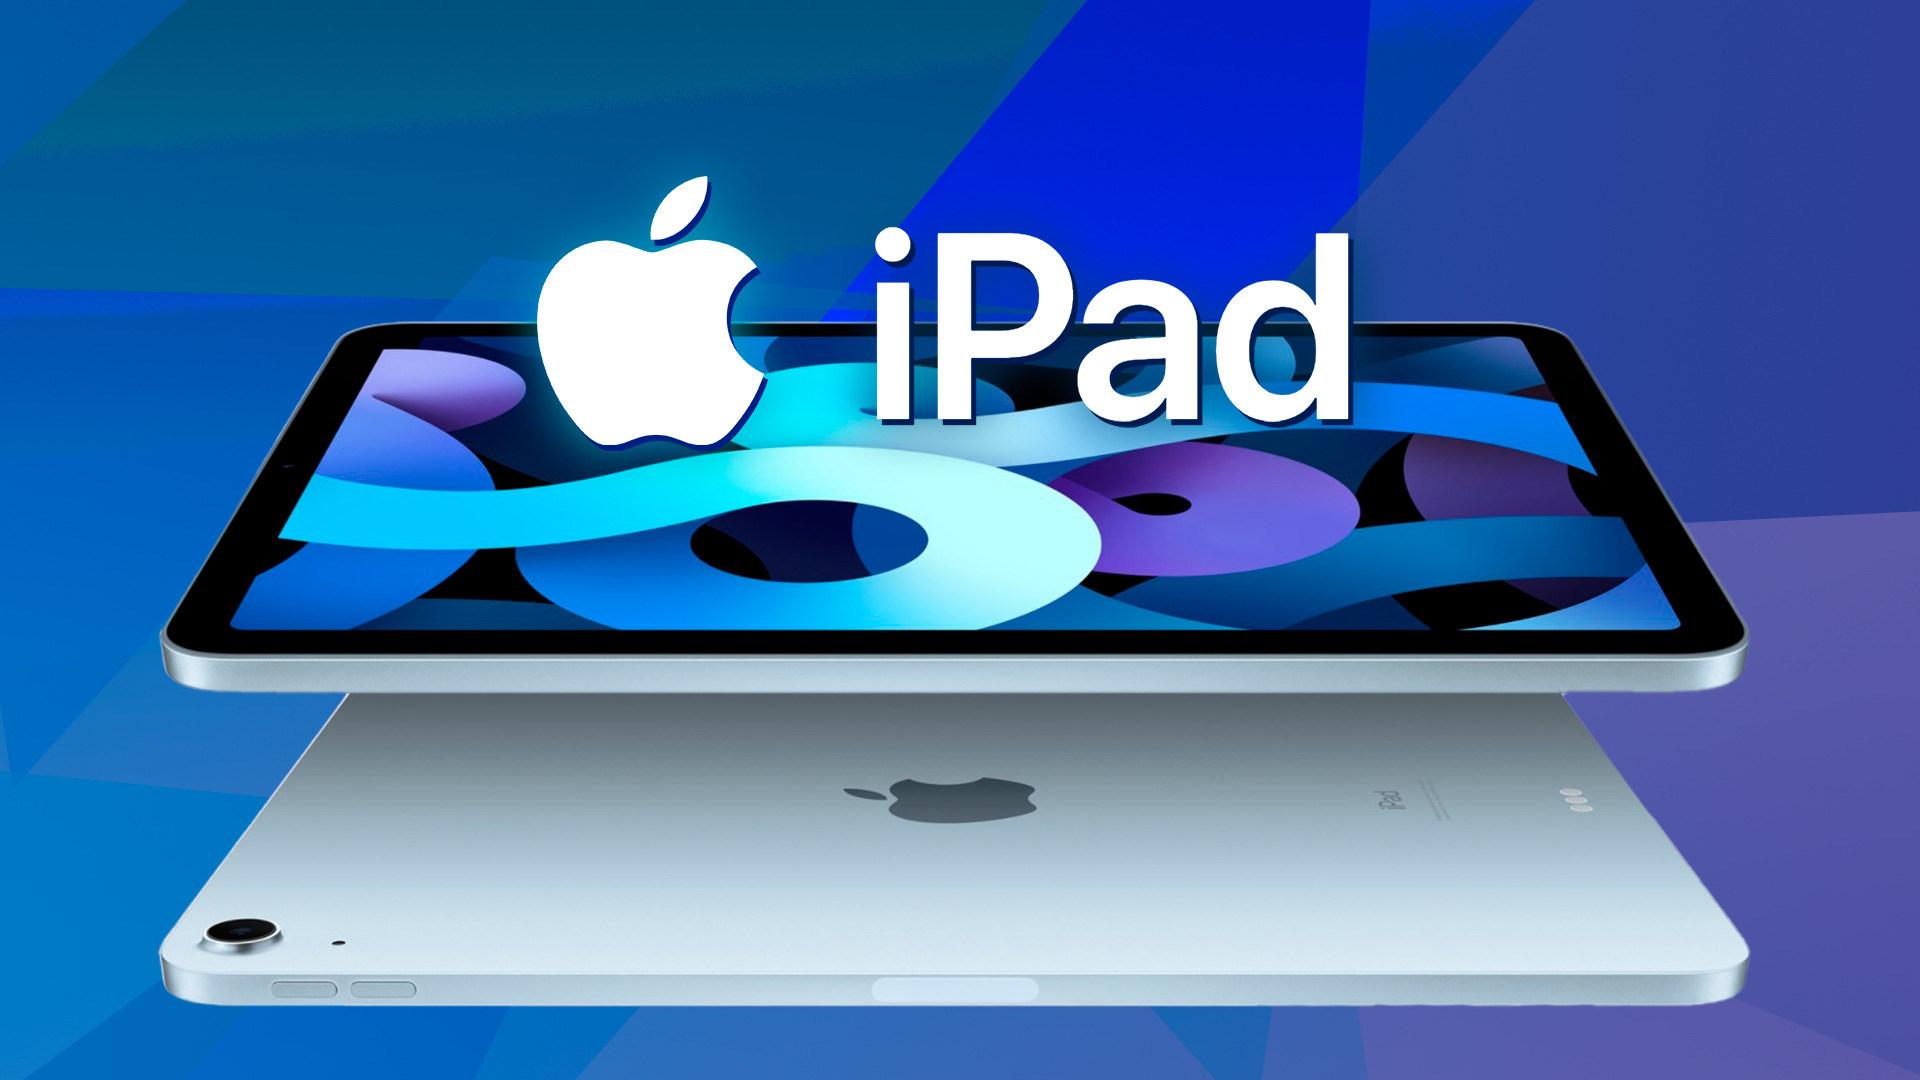 Apple, Tablet, Logo, Ipad, Apple Ipad, ipad pro, iPadOS, iPad mini, Apple iPad Pro, iPad air, Apple iPadOS, Apple iPad air, Apple iPad mini